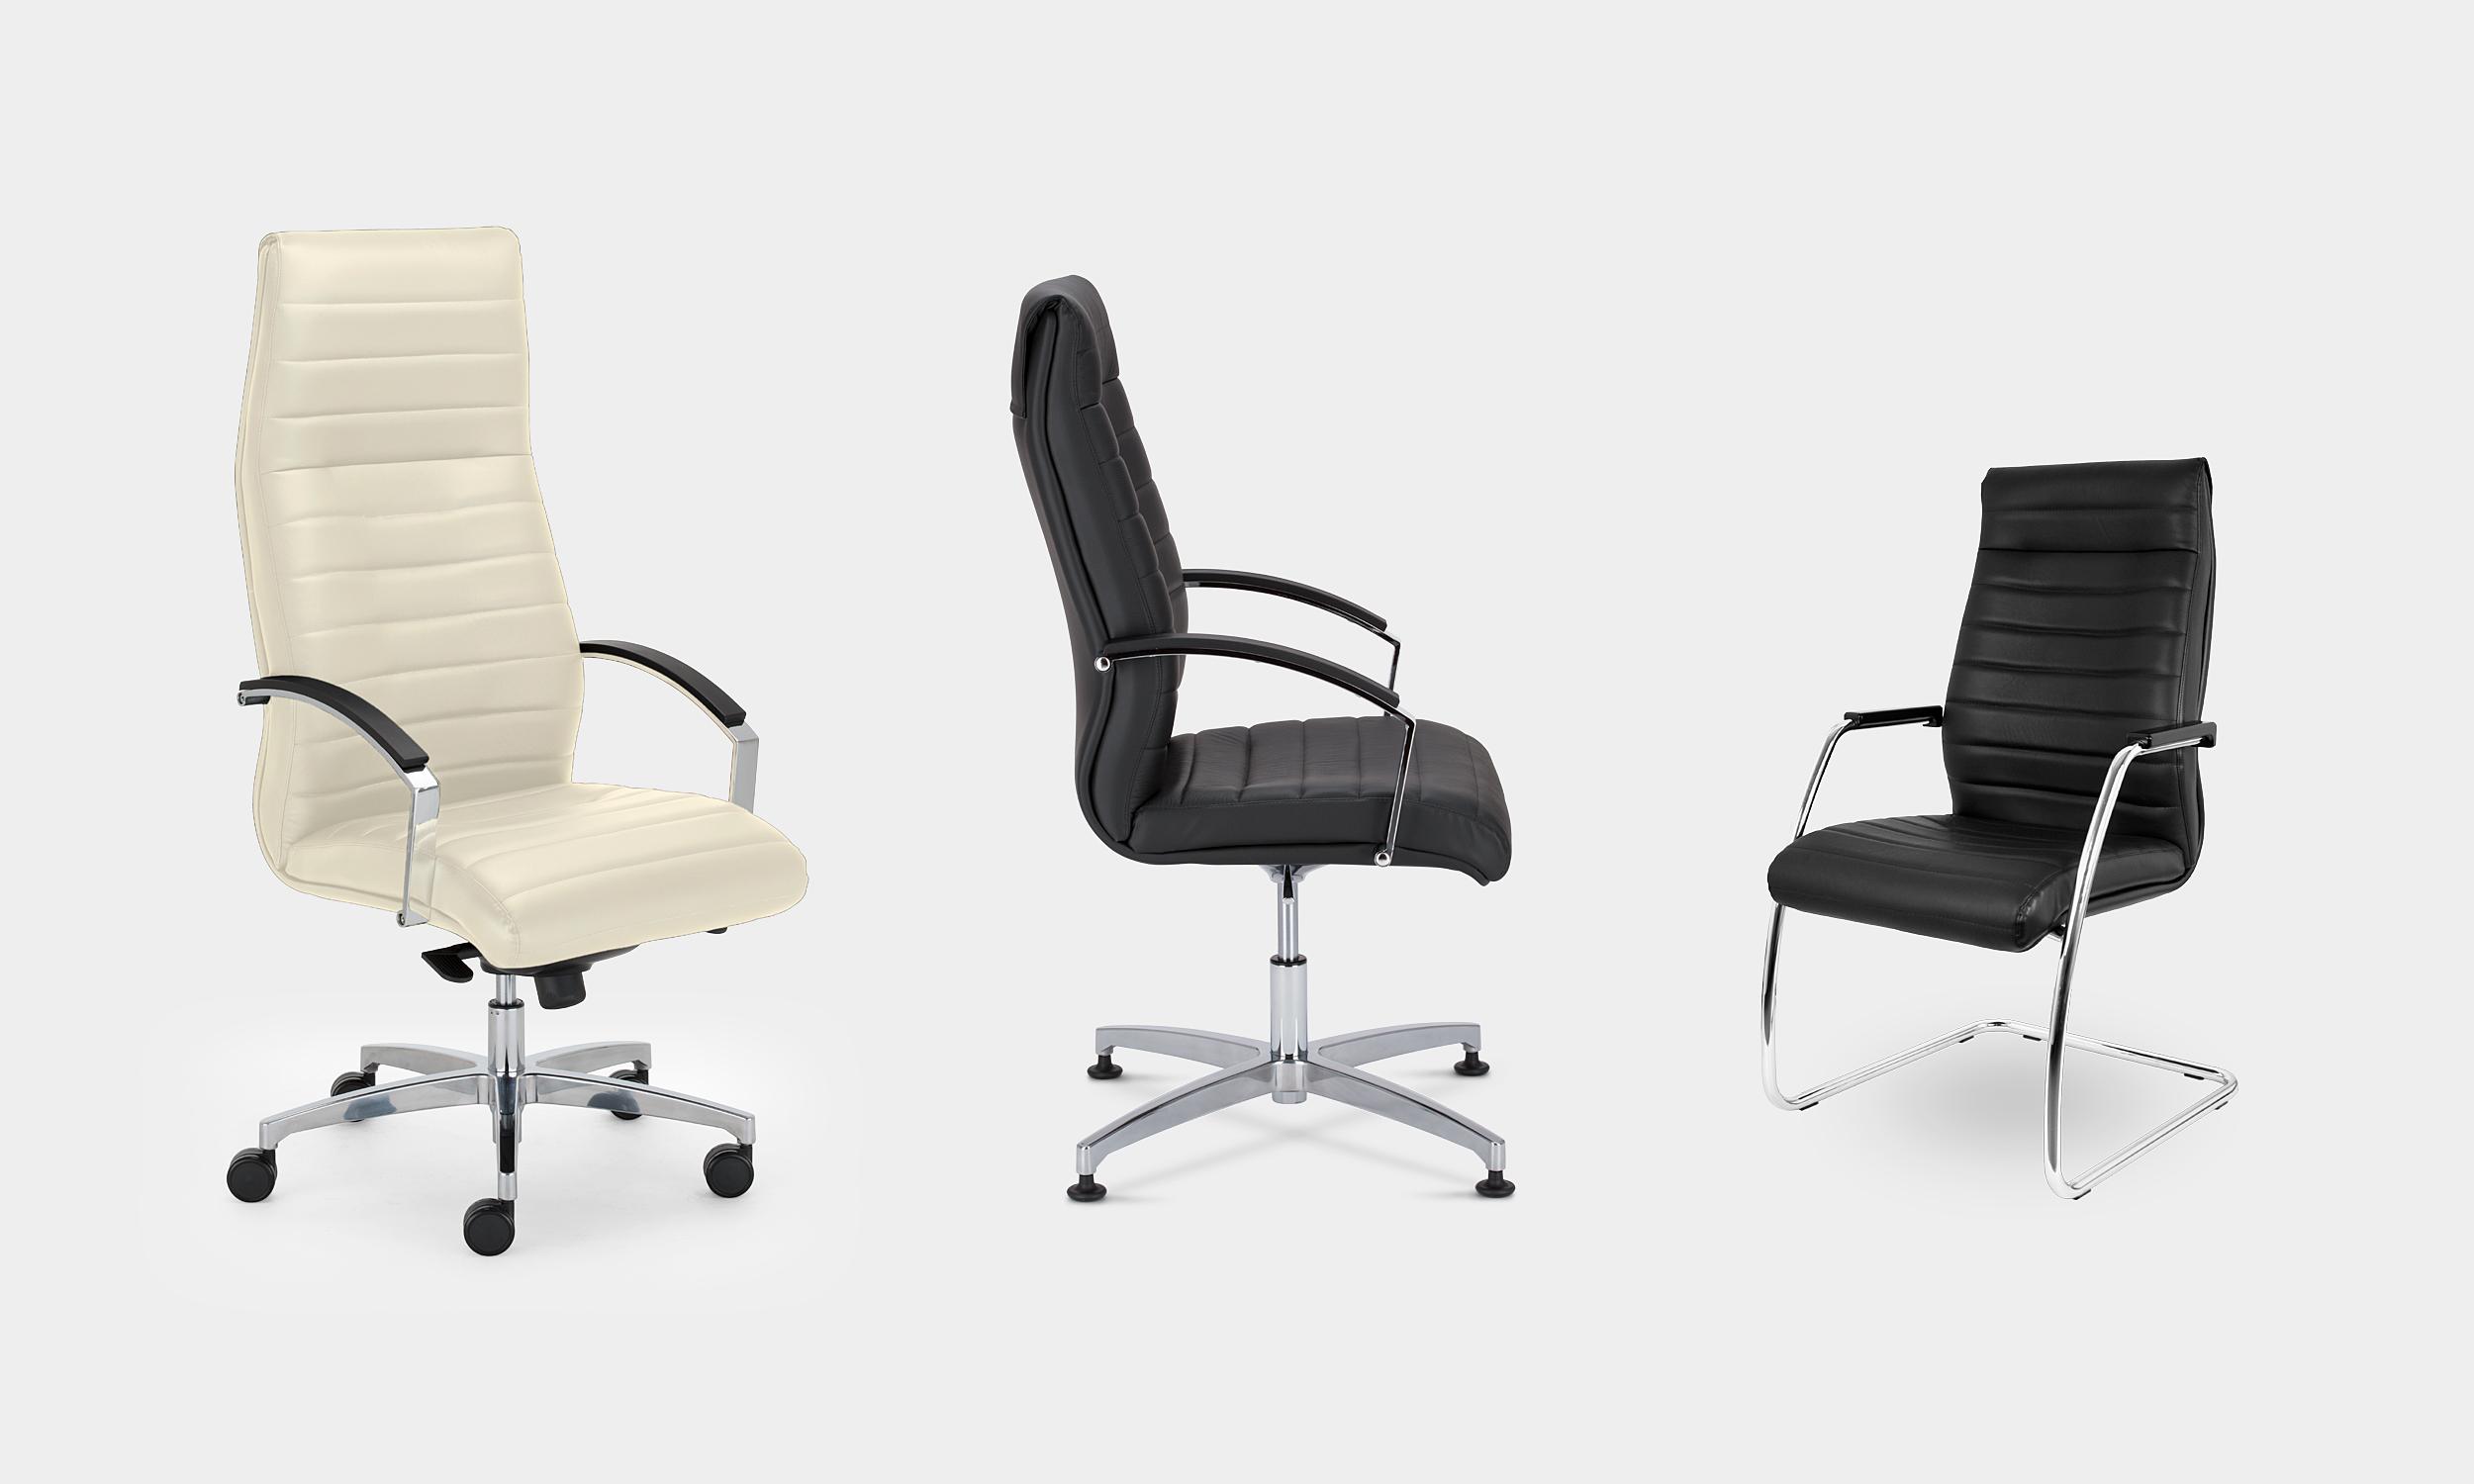 office-chairs_10-6_Lynx-1.jpg